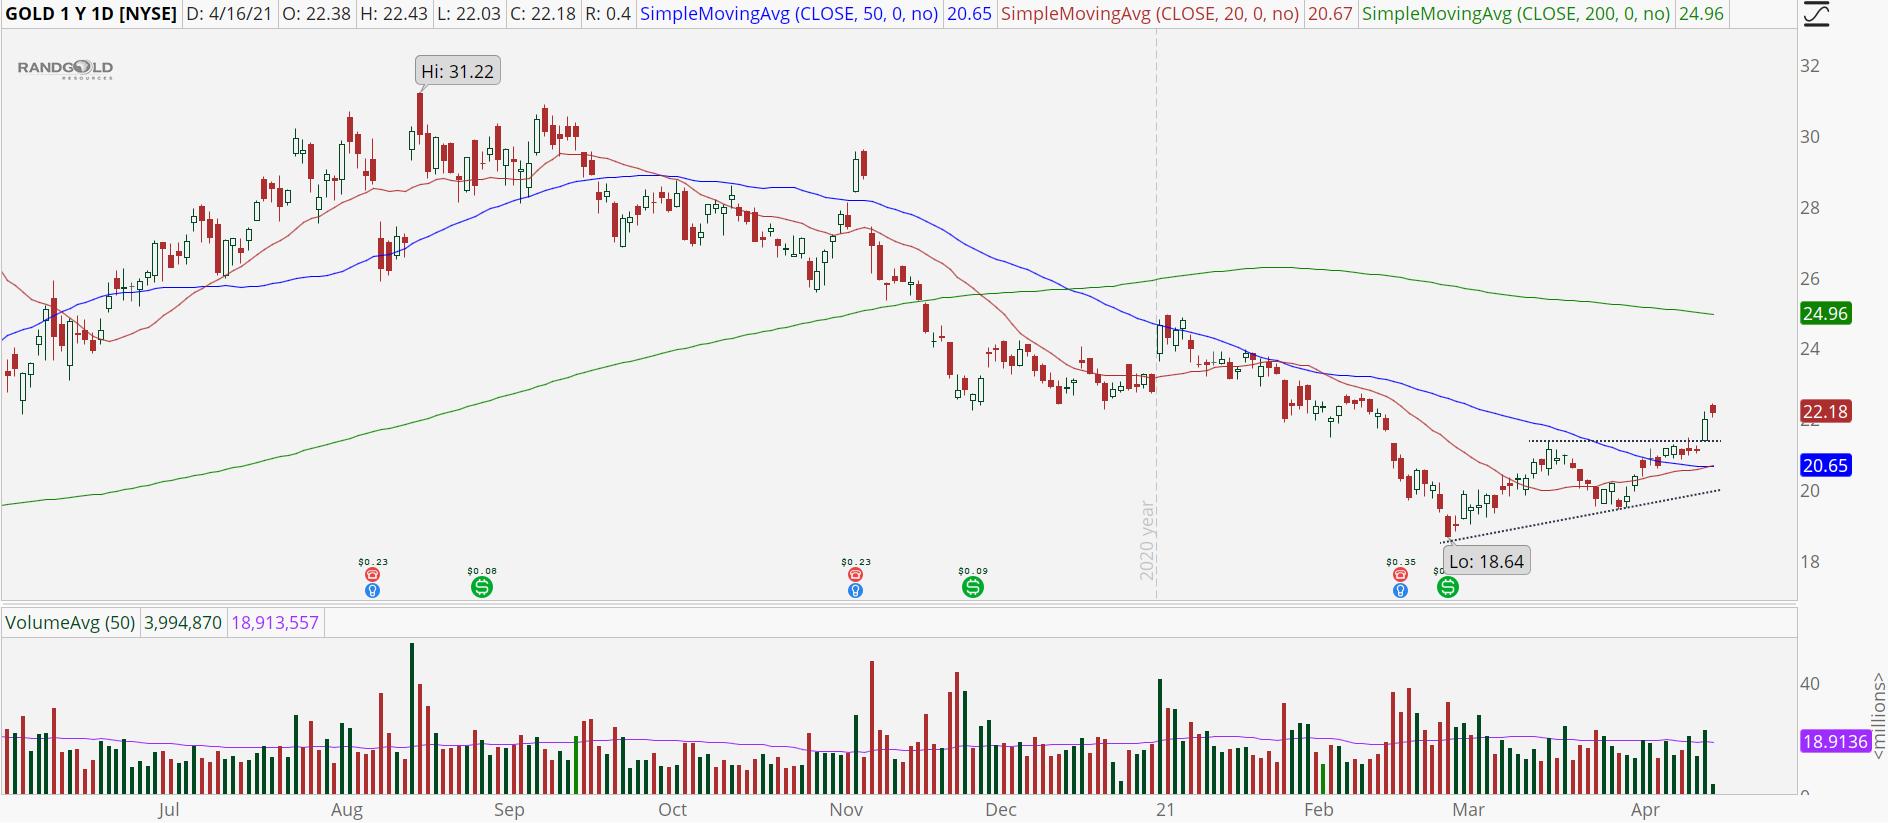 Barrick Gold (GOLD) stock chart with bullish breakout